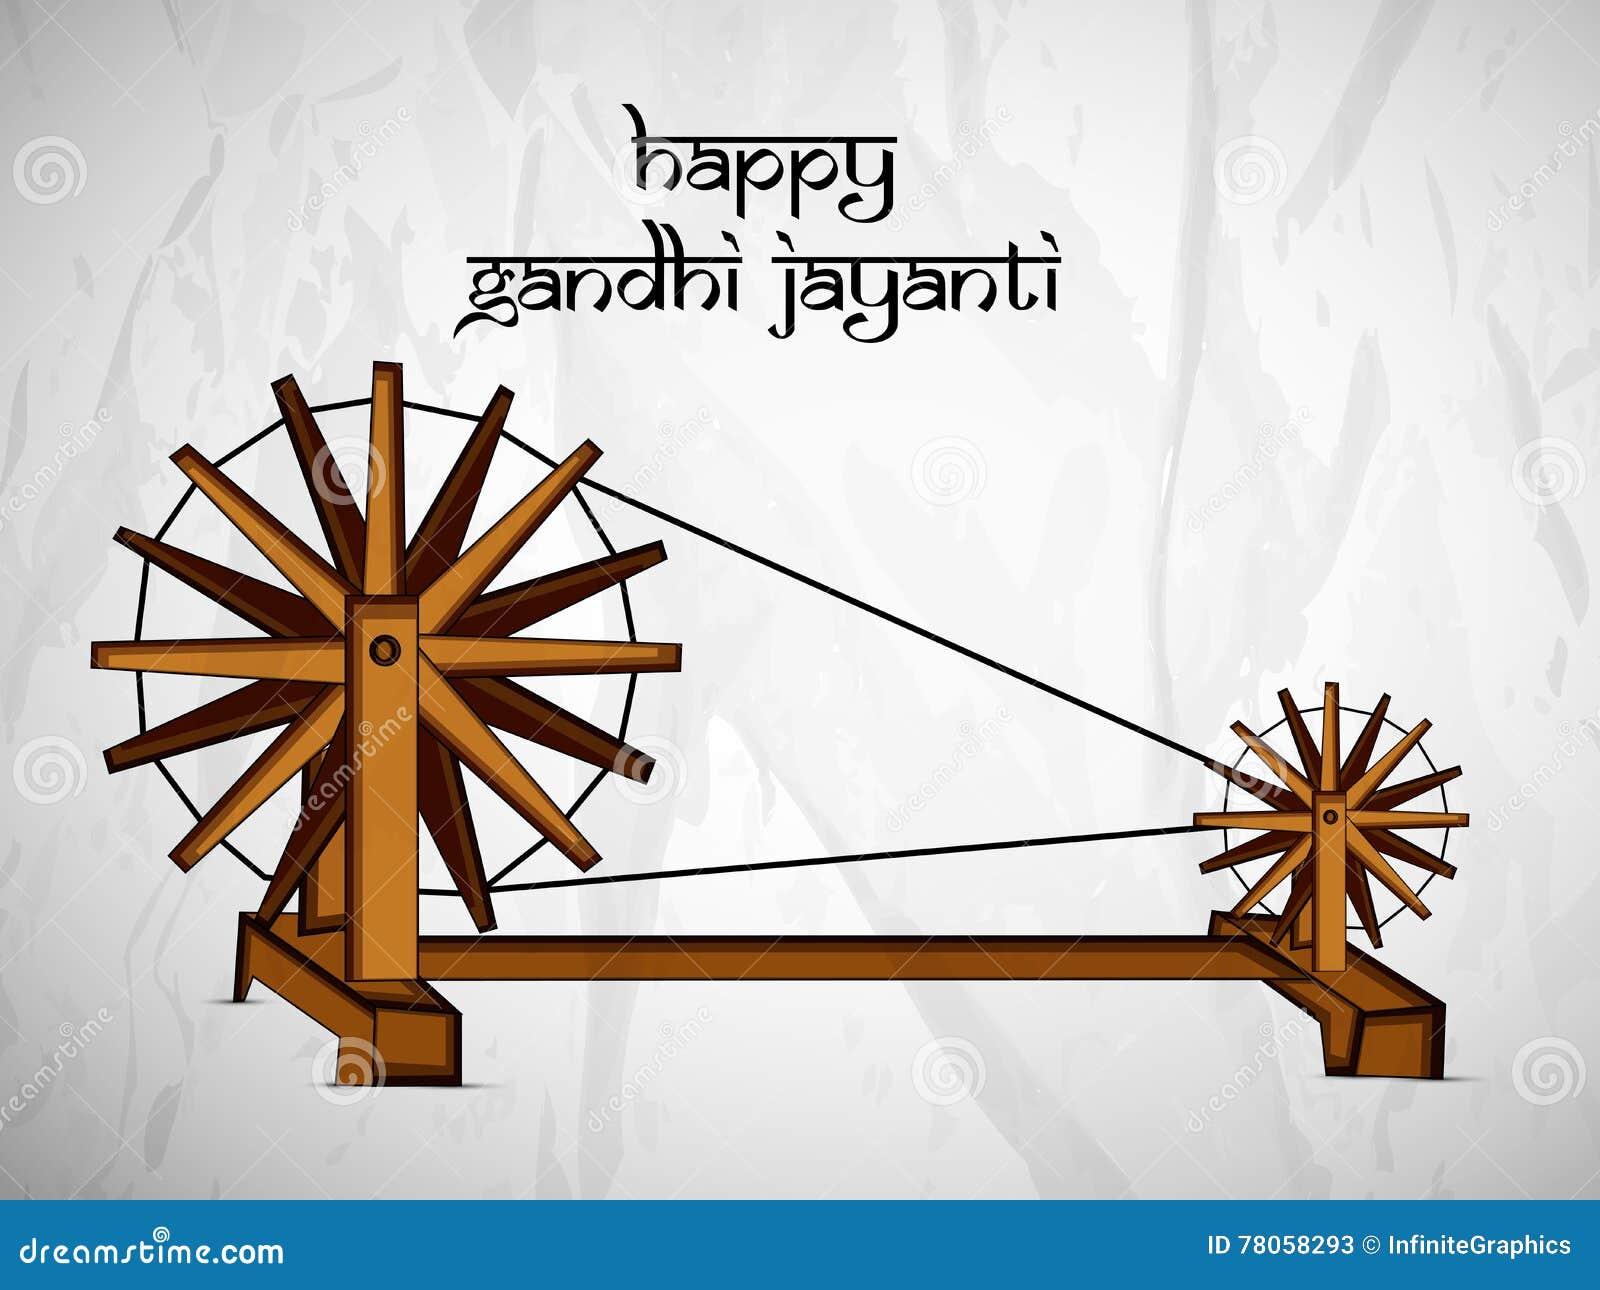 Gandhi Jayanti Background Stock Vector Image Of Handcrafted 78058293